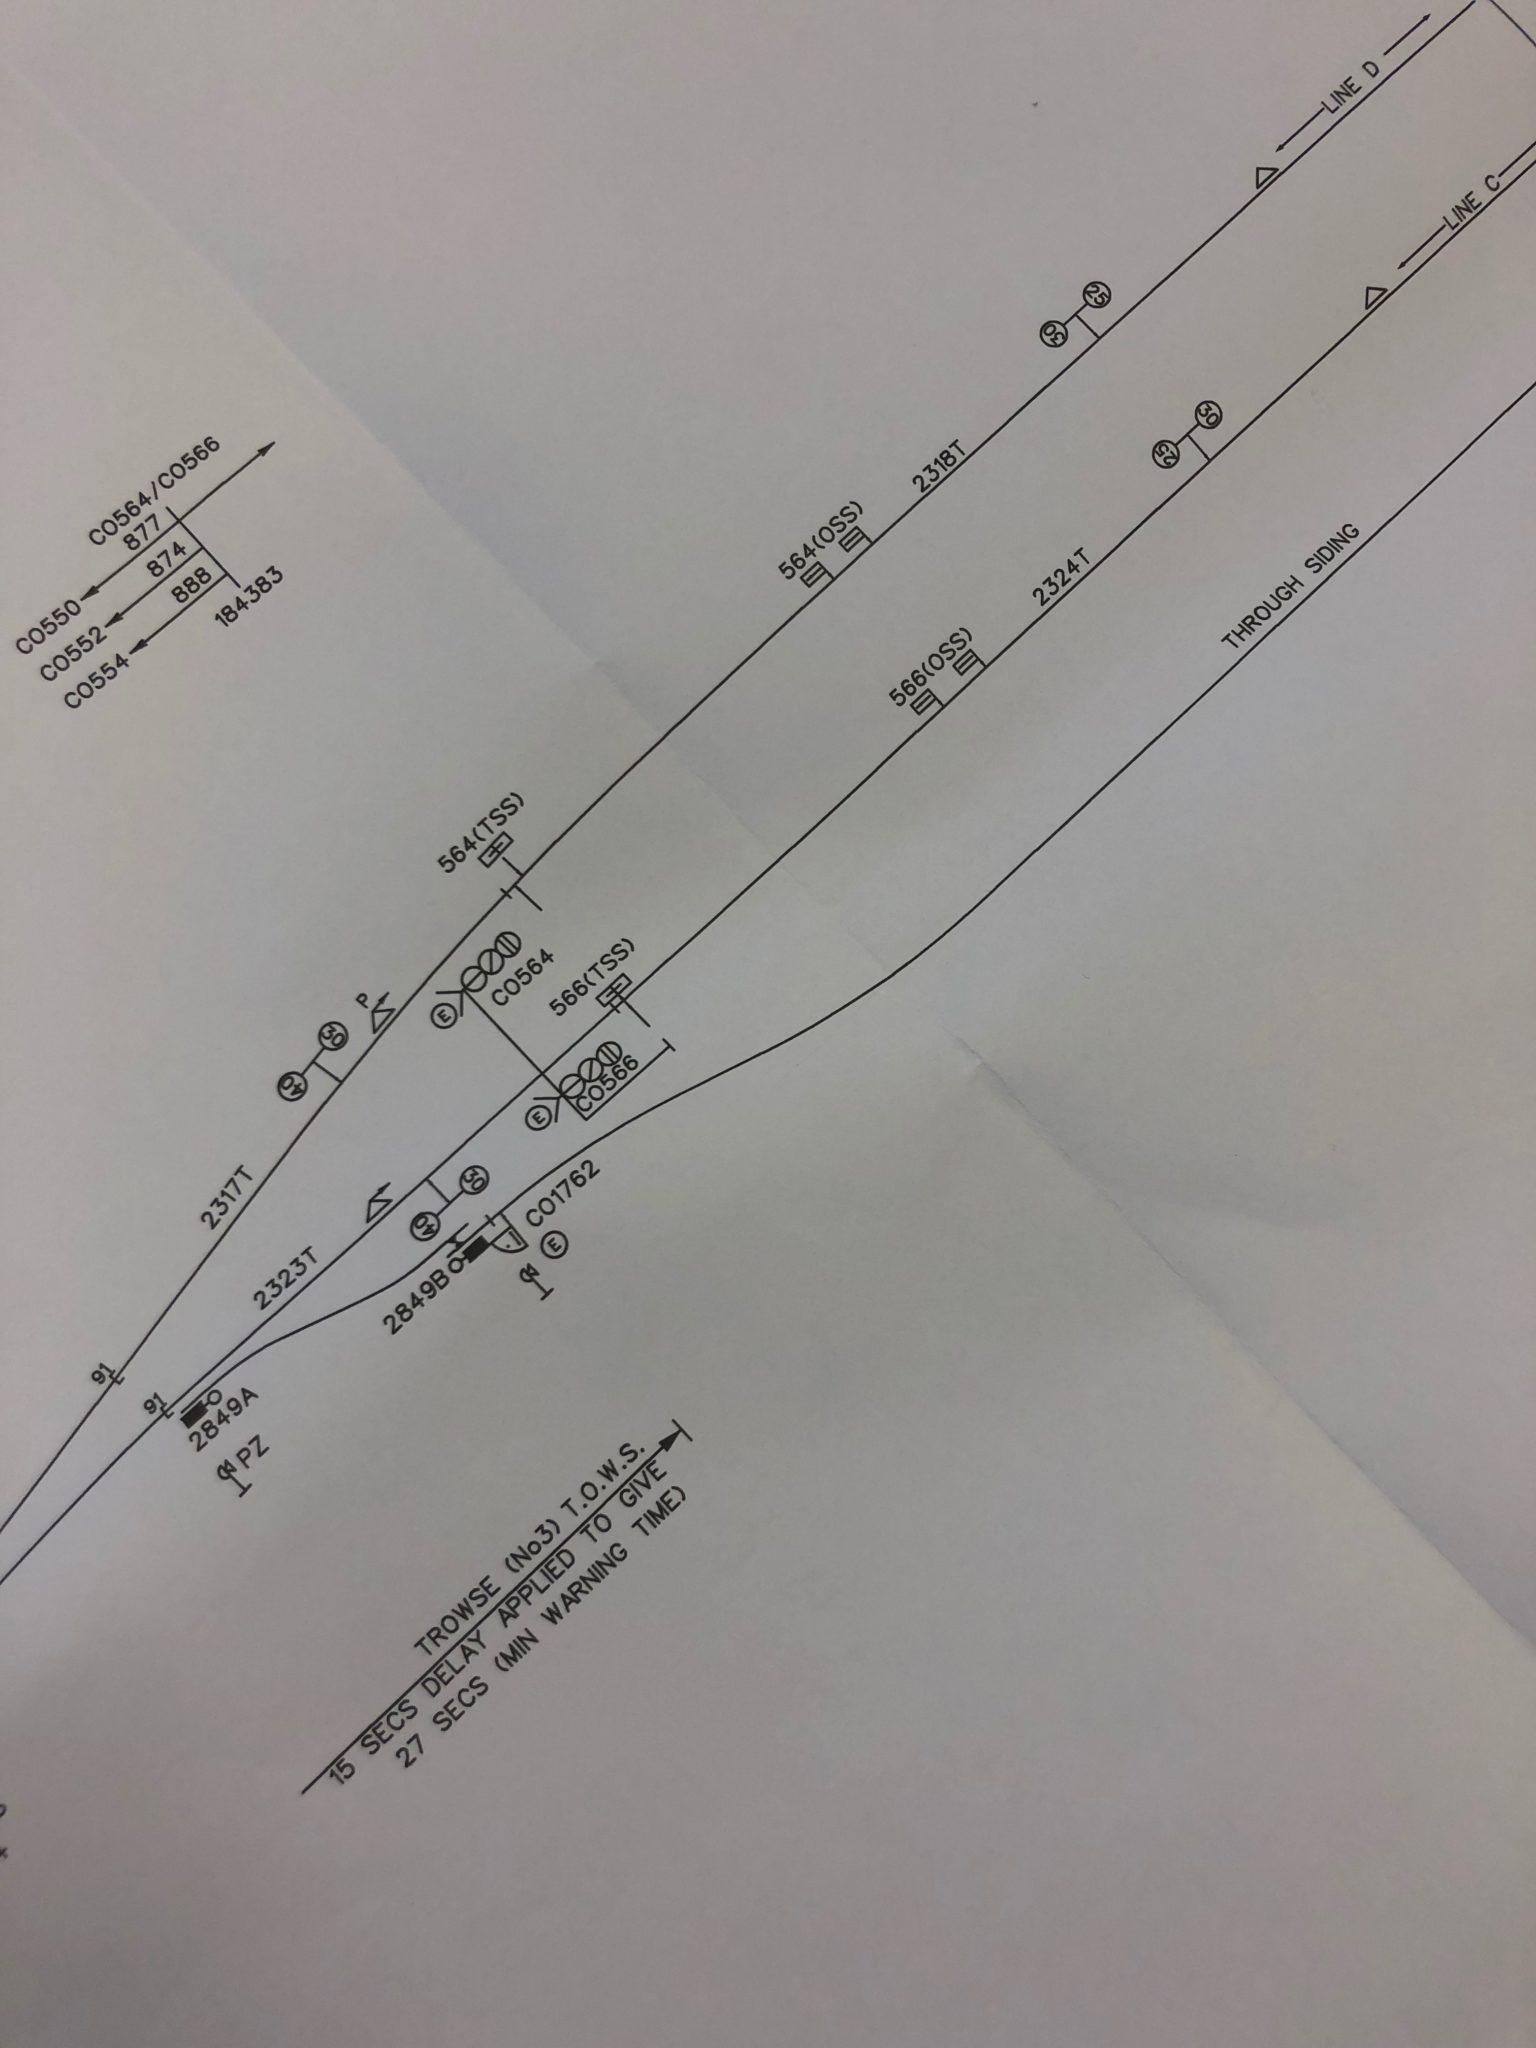 Railway Track Design Solutions